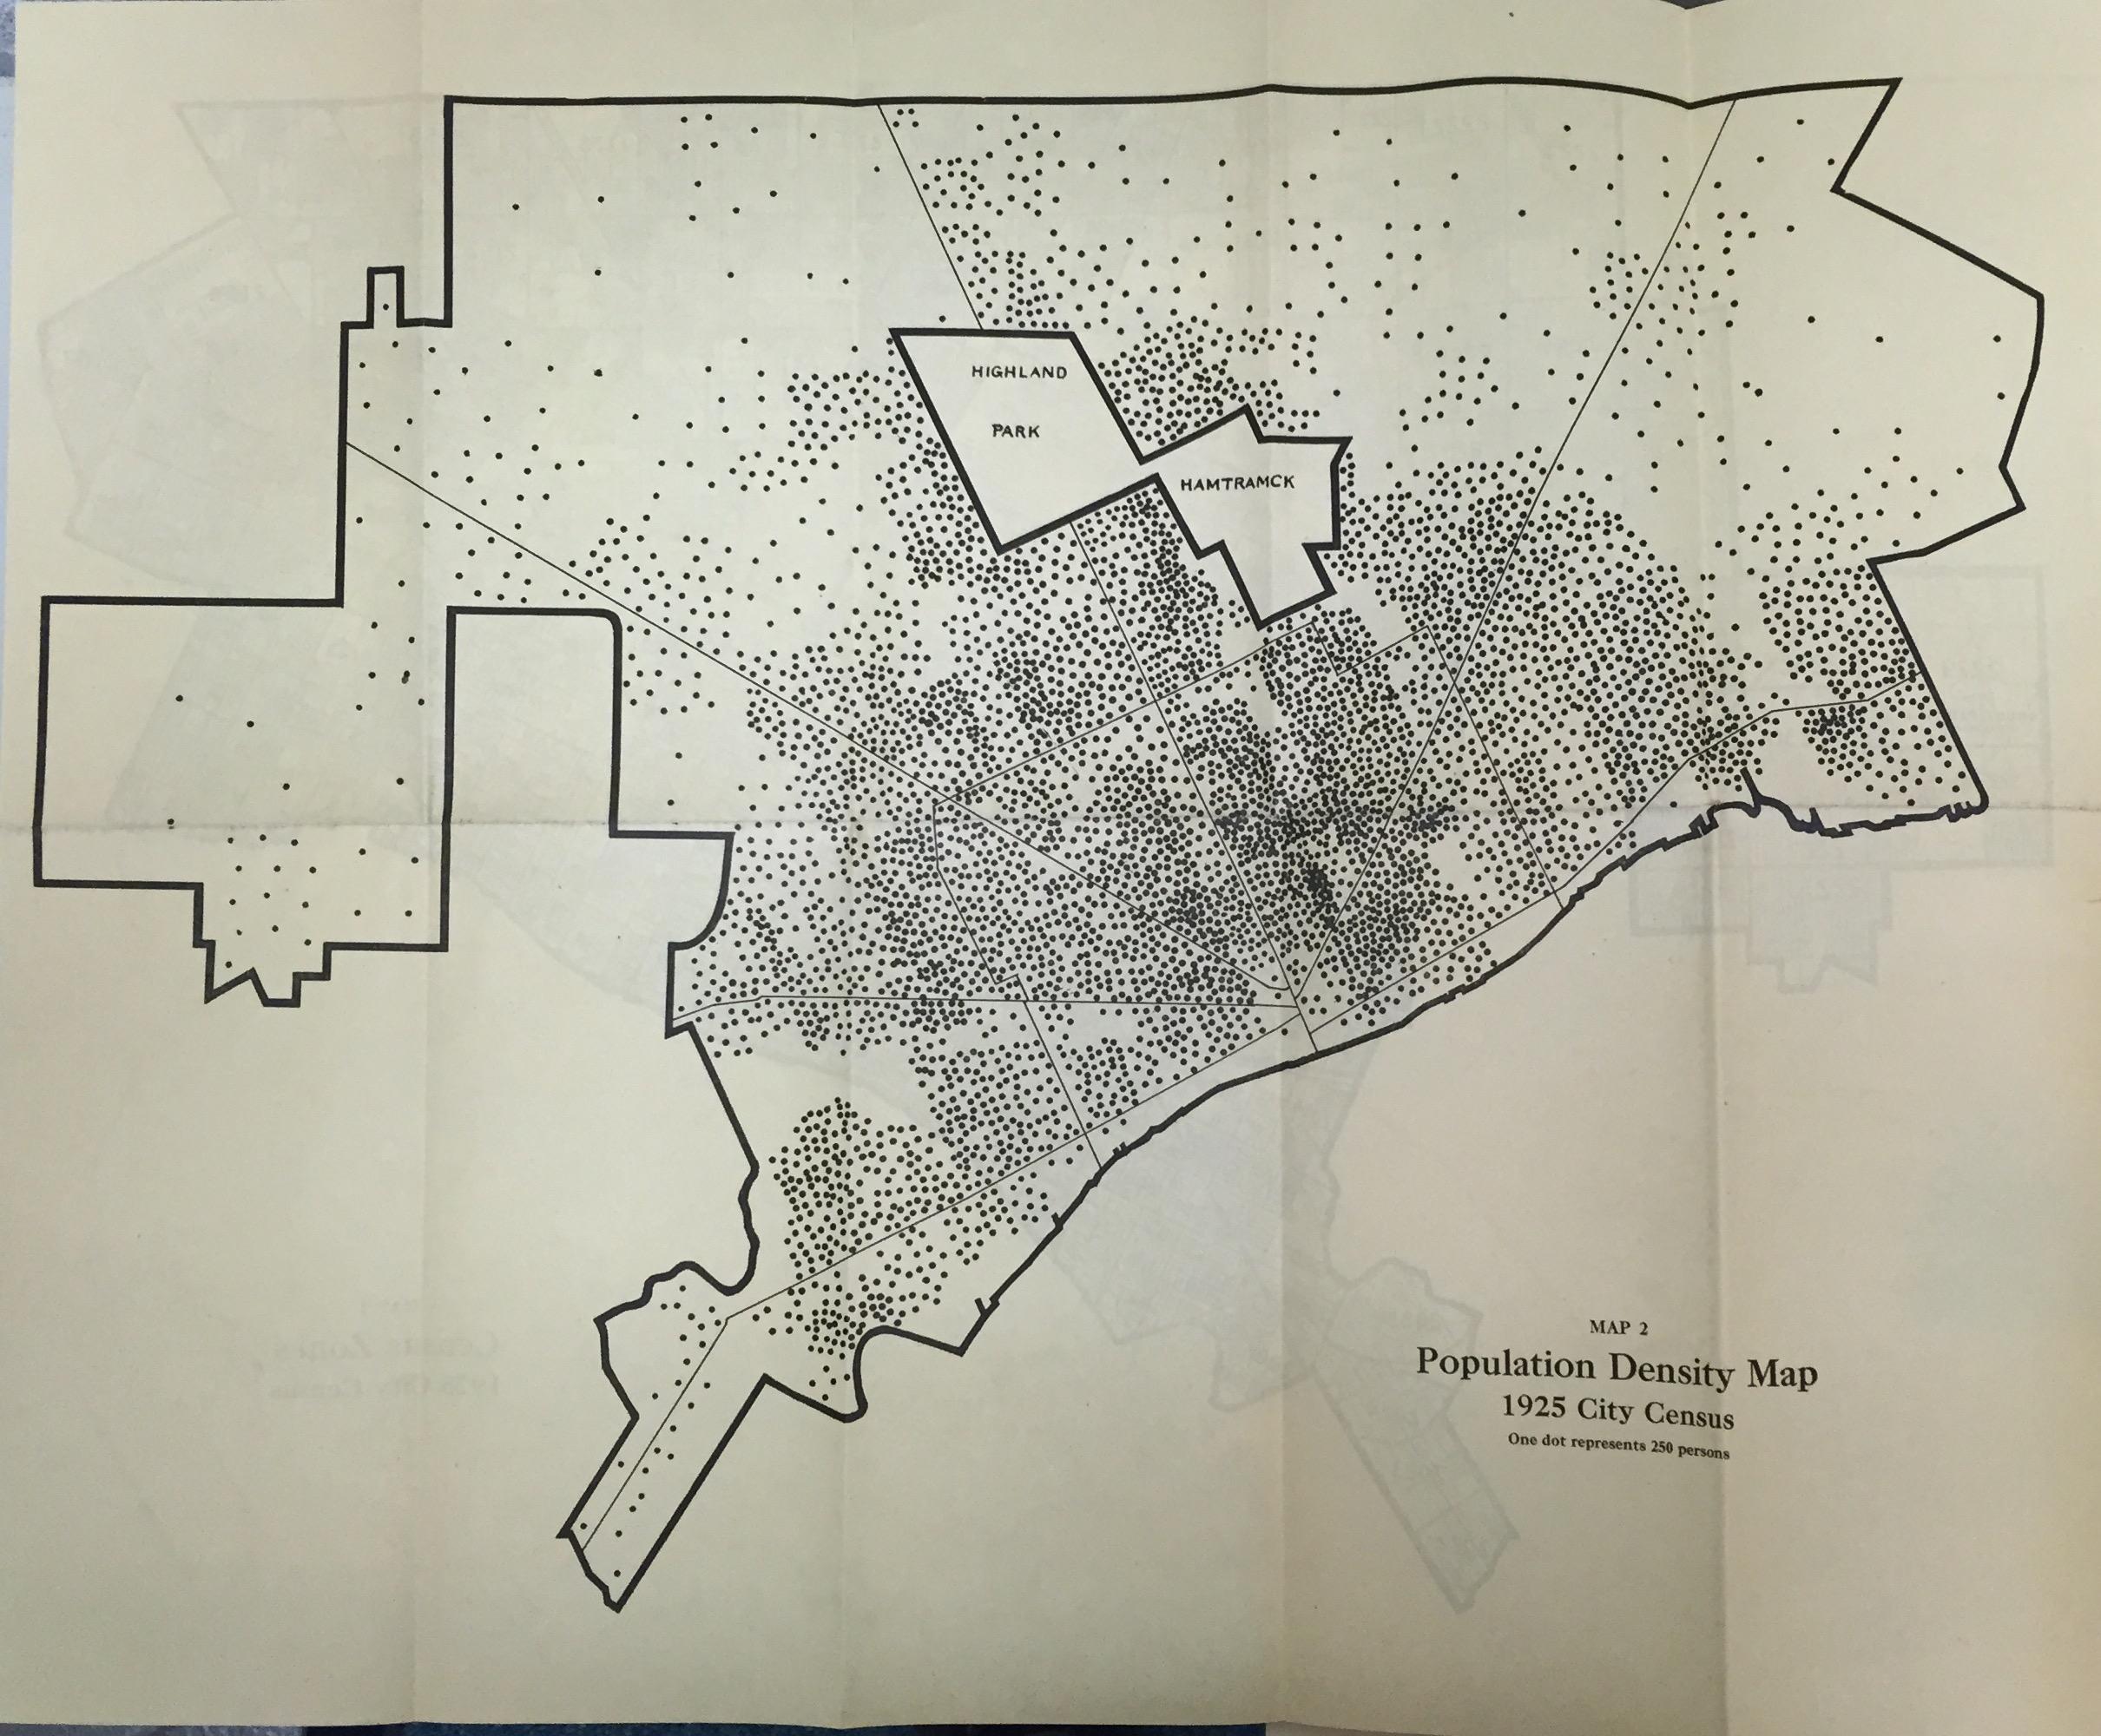 Population Density Map Detroit City Census DETROITography - Us population density map census tract